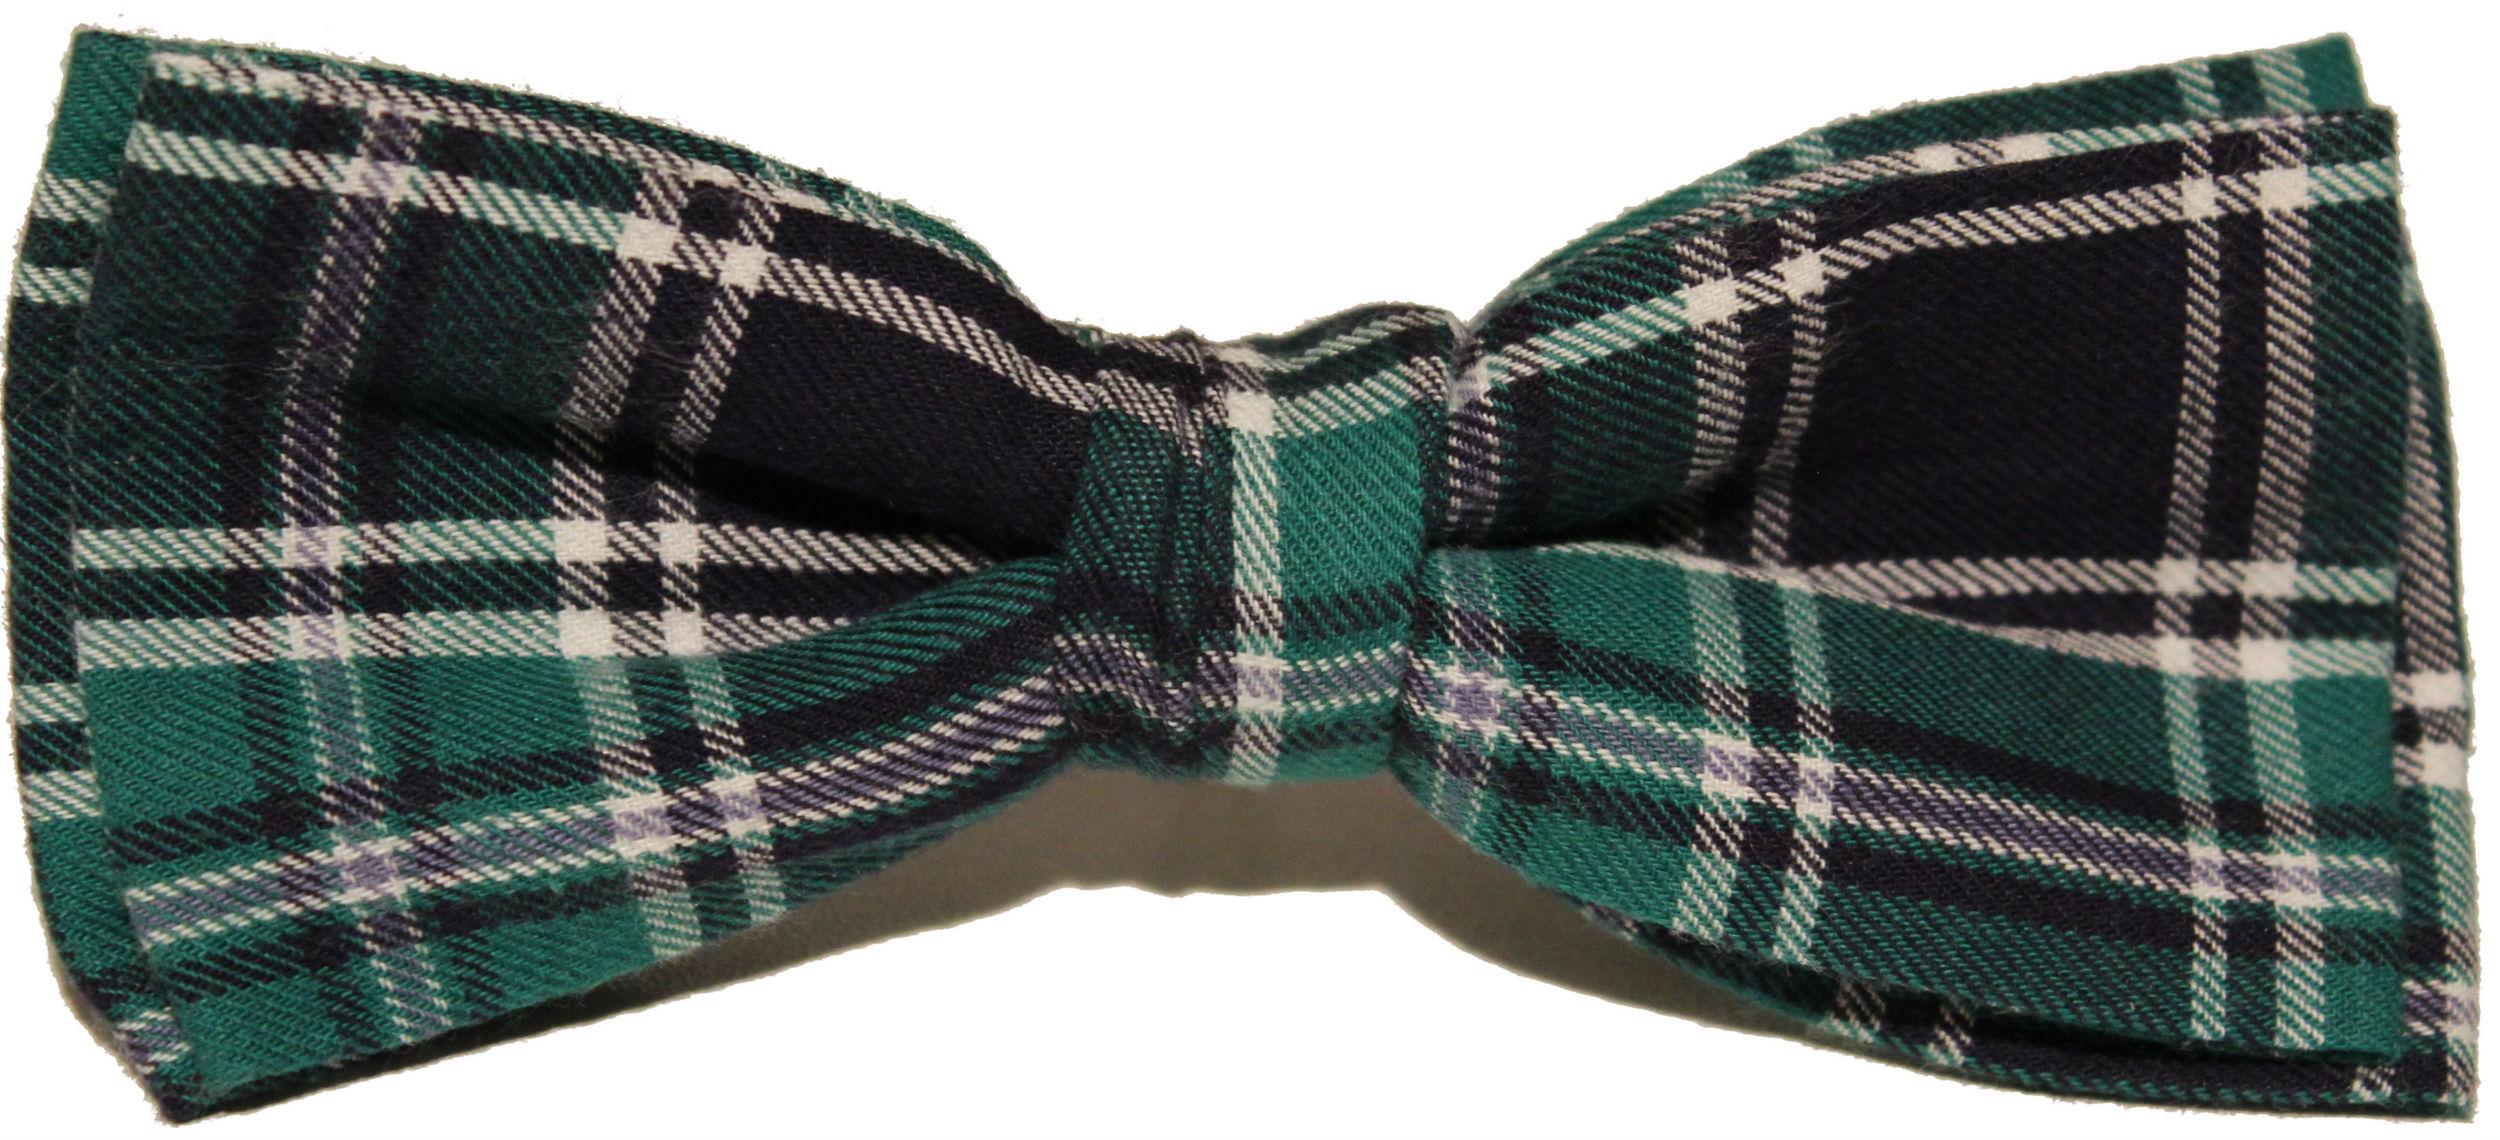 Highland Kestrel